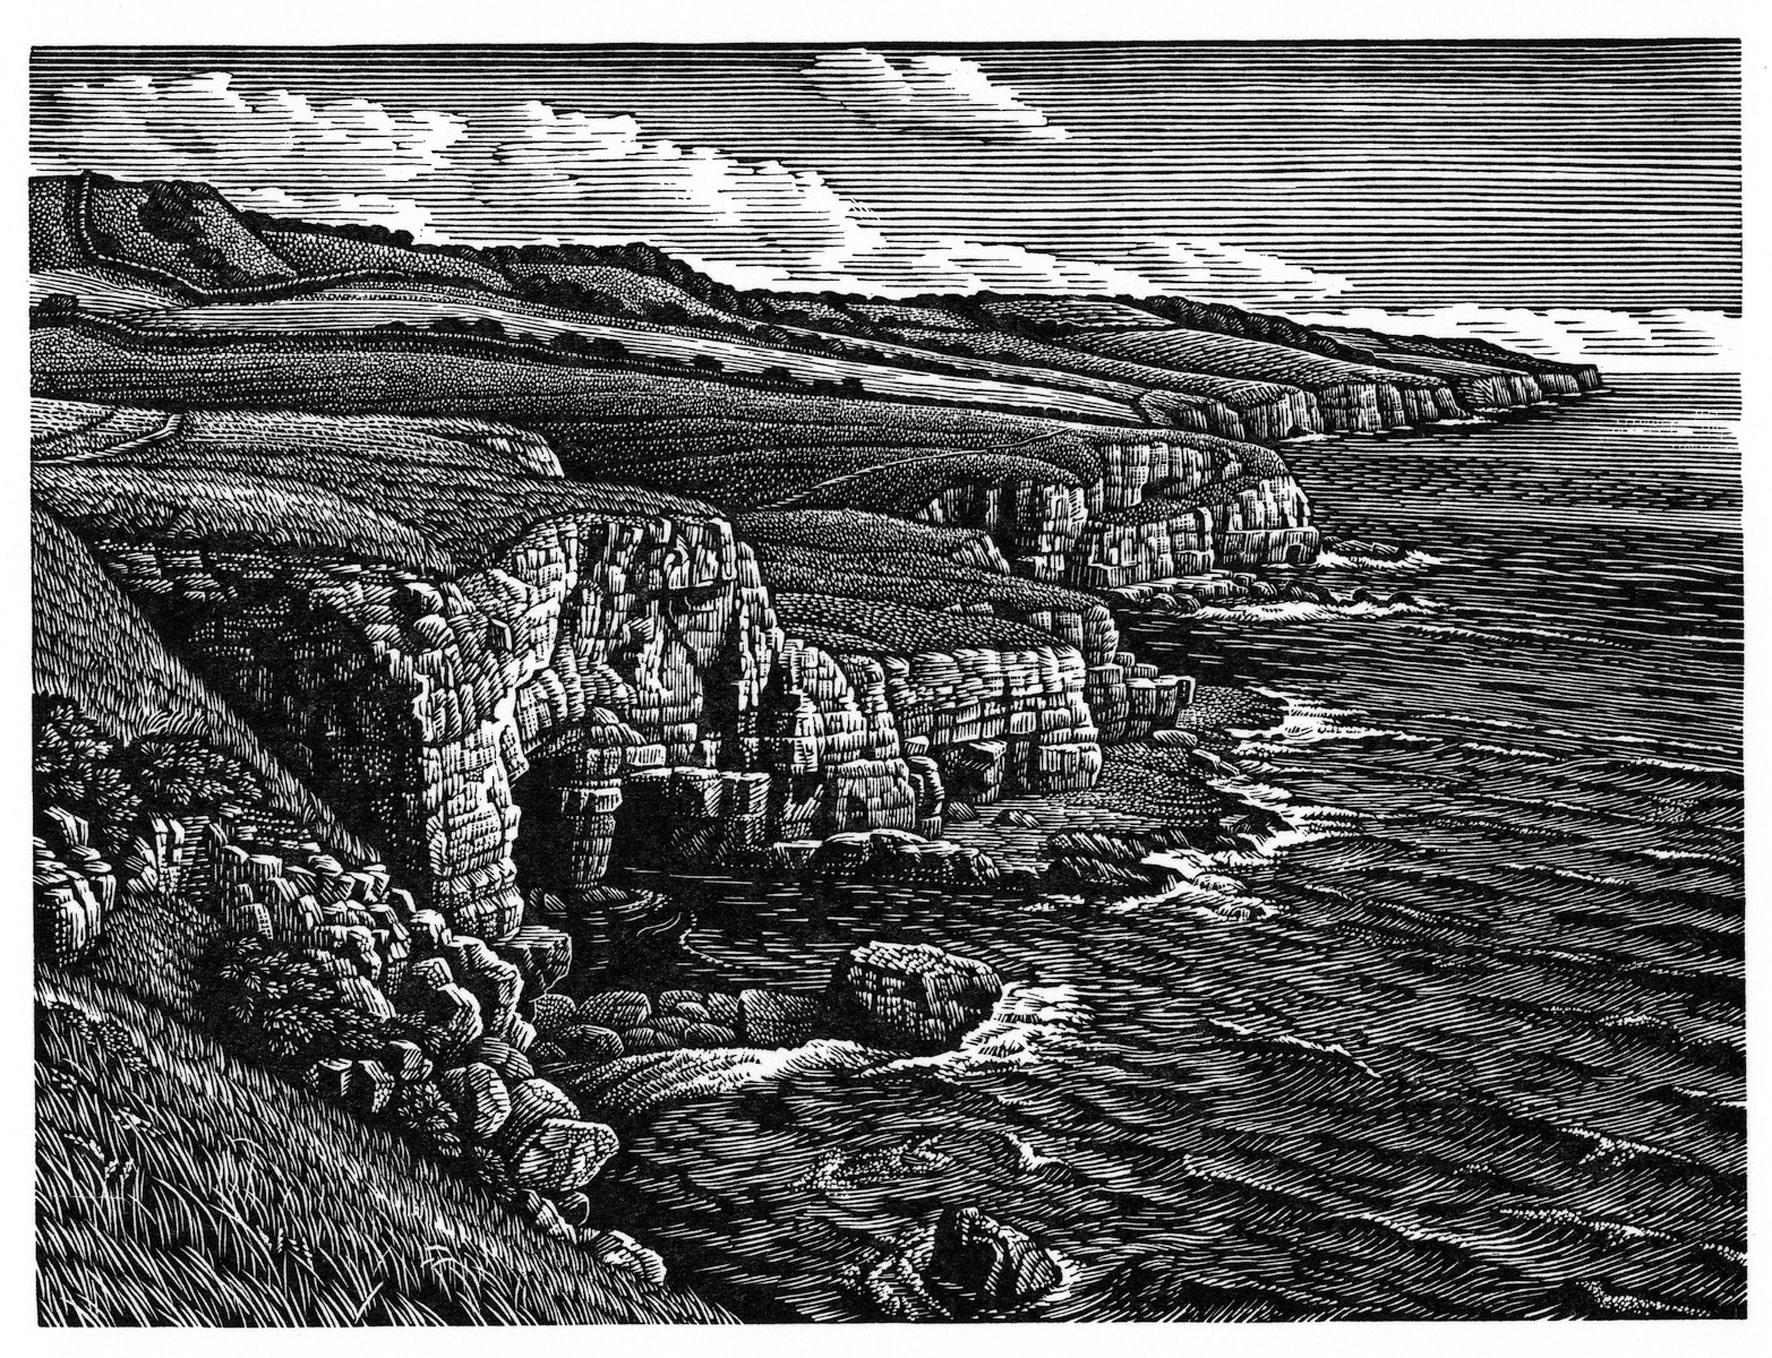 "<span class=""link fancybox-details-link""><a href=""/artists/331-howard-phipps-are/works/11496/"">View Detail Page</a></span><div class=""artist""><span class=""artist""><strong>Howard Phipps ARE</strong></span></div><div class=""title""><em>Dorset Coast, Seacombe</em></div><div class=""medium"">wood engraving</div><div class=""dimensions"">34 x 37 cm framed<br /> 11.5 x 15 cm image size</div><div class=""edition_details"">edition of 150</div><div class=""price"">£345.00 framed<br>£245.00 unframed</div>"